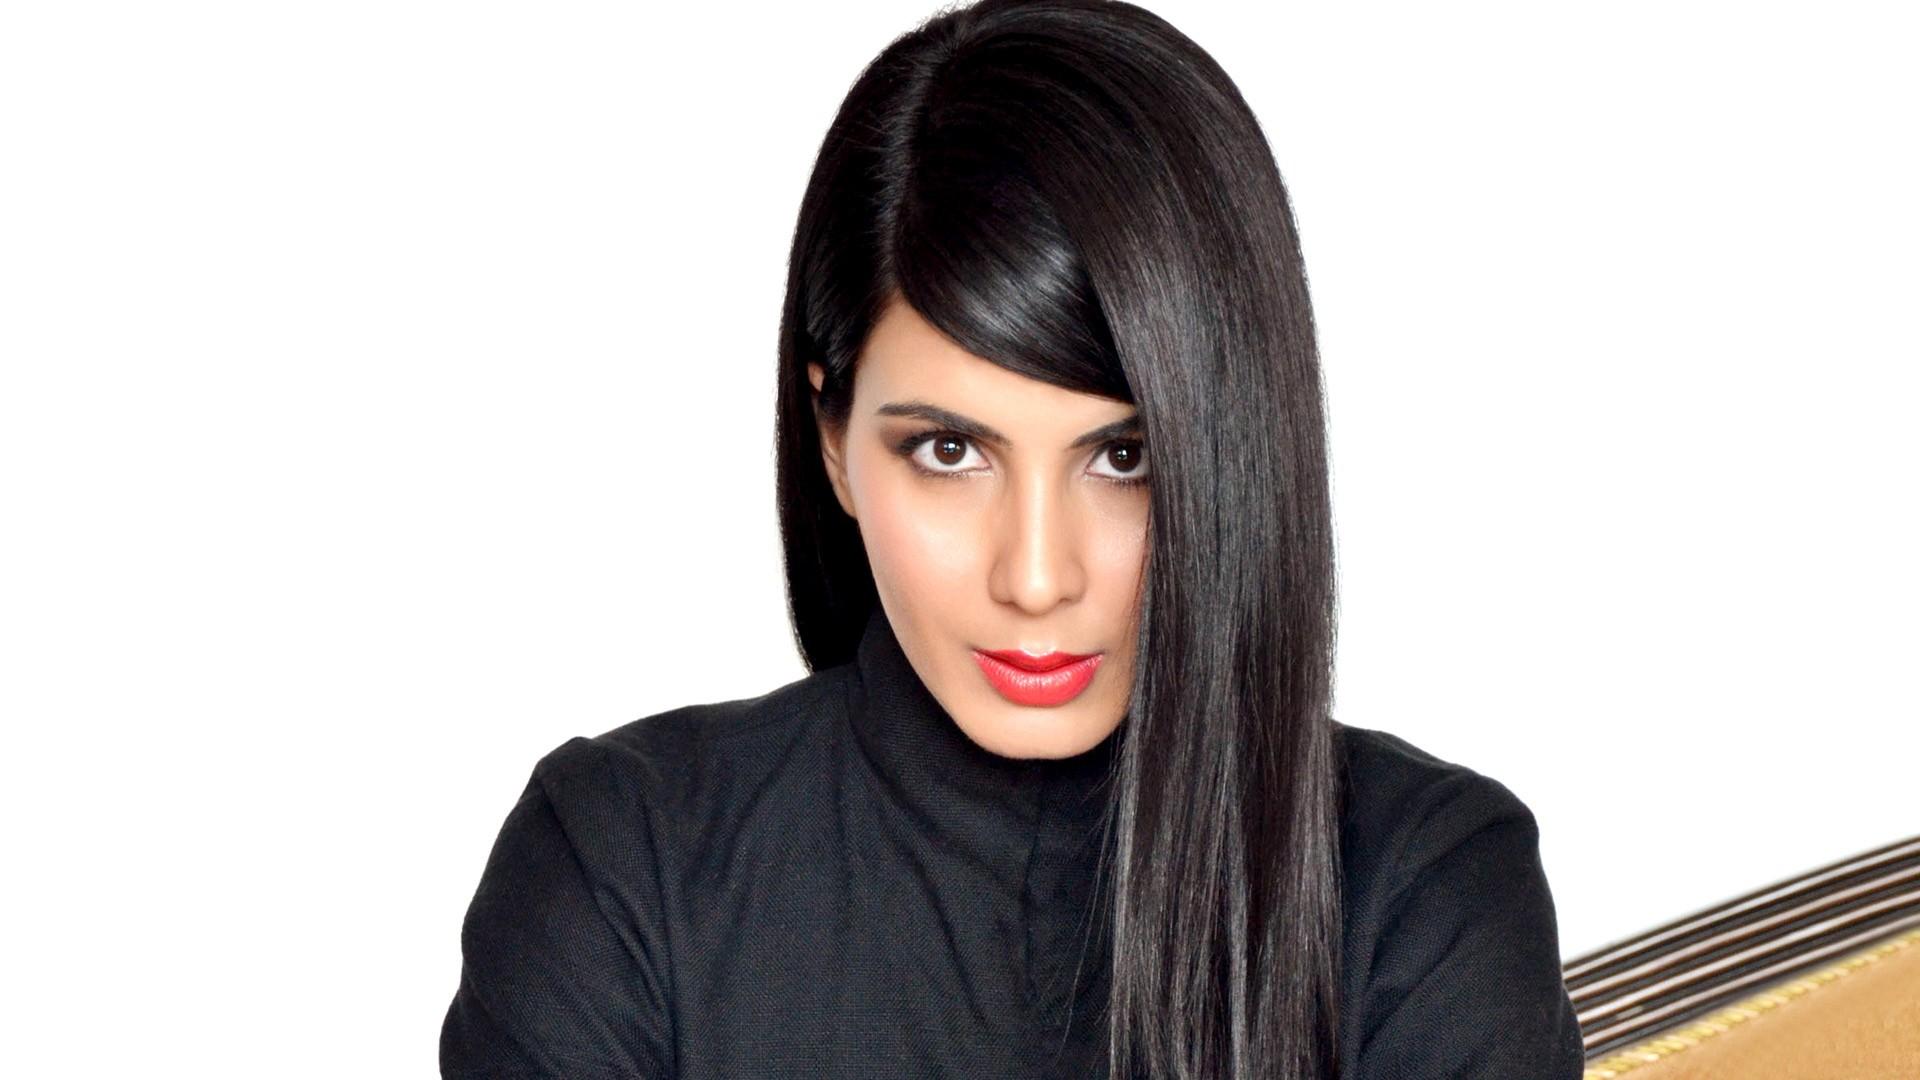 Wallpaper Kirti kulhari Actress